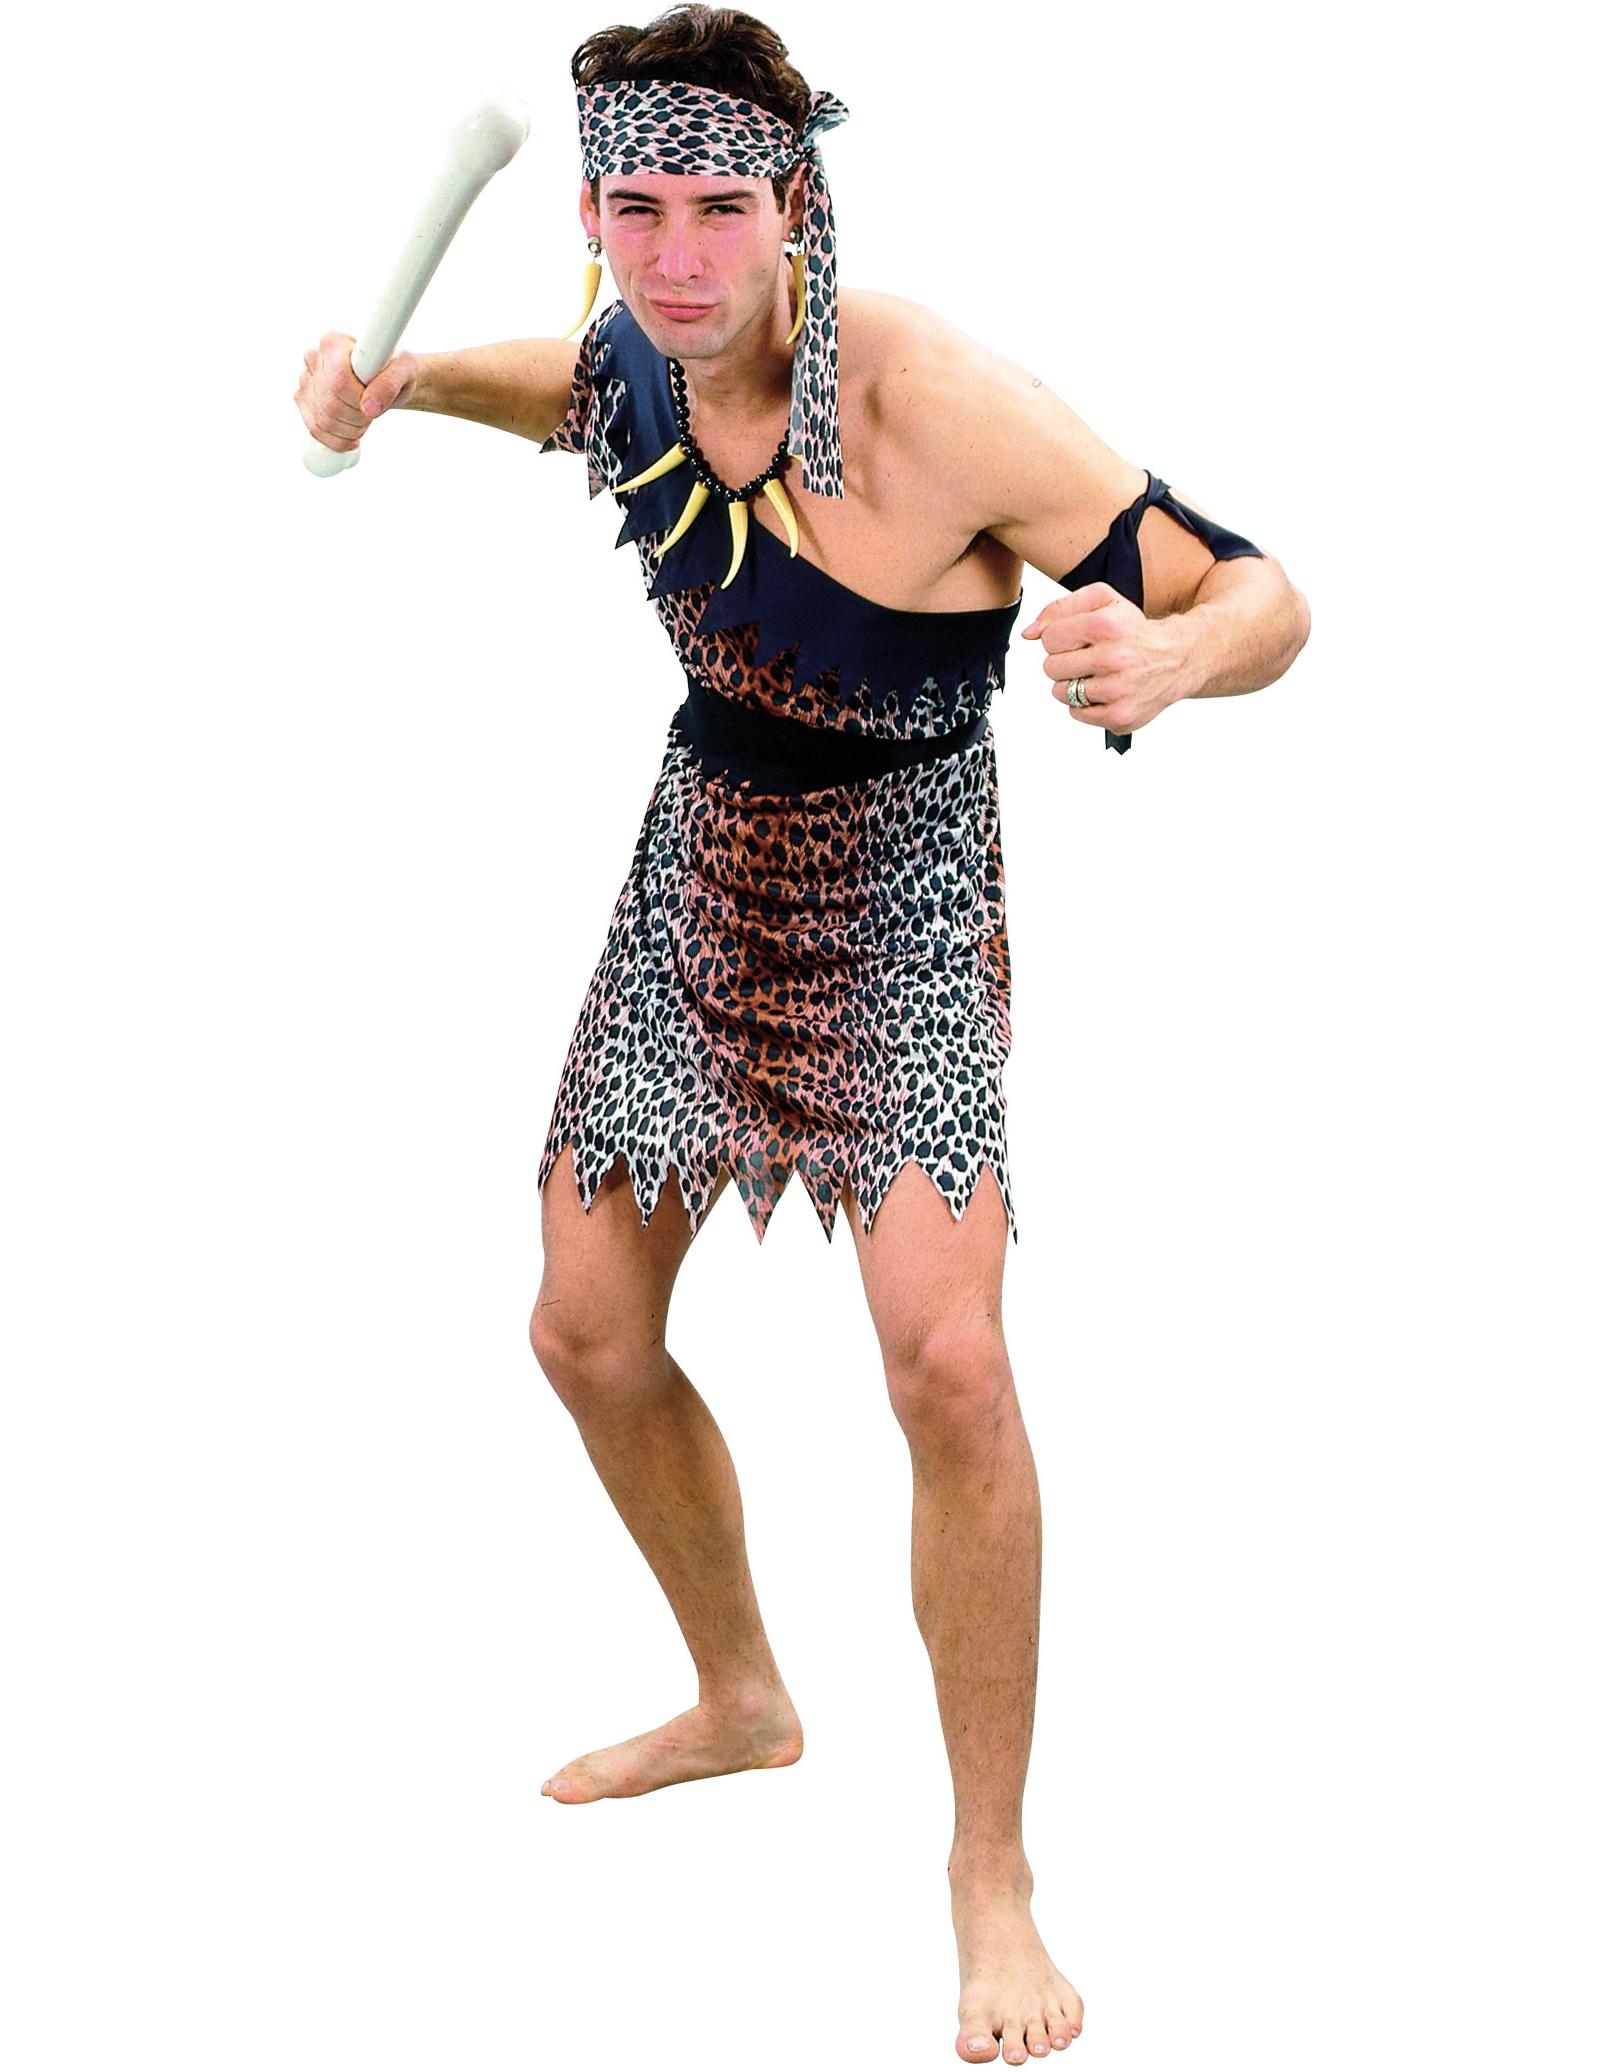 Caveman Costume Accessories : Caveman costume